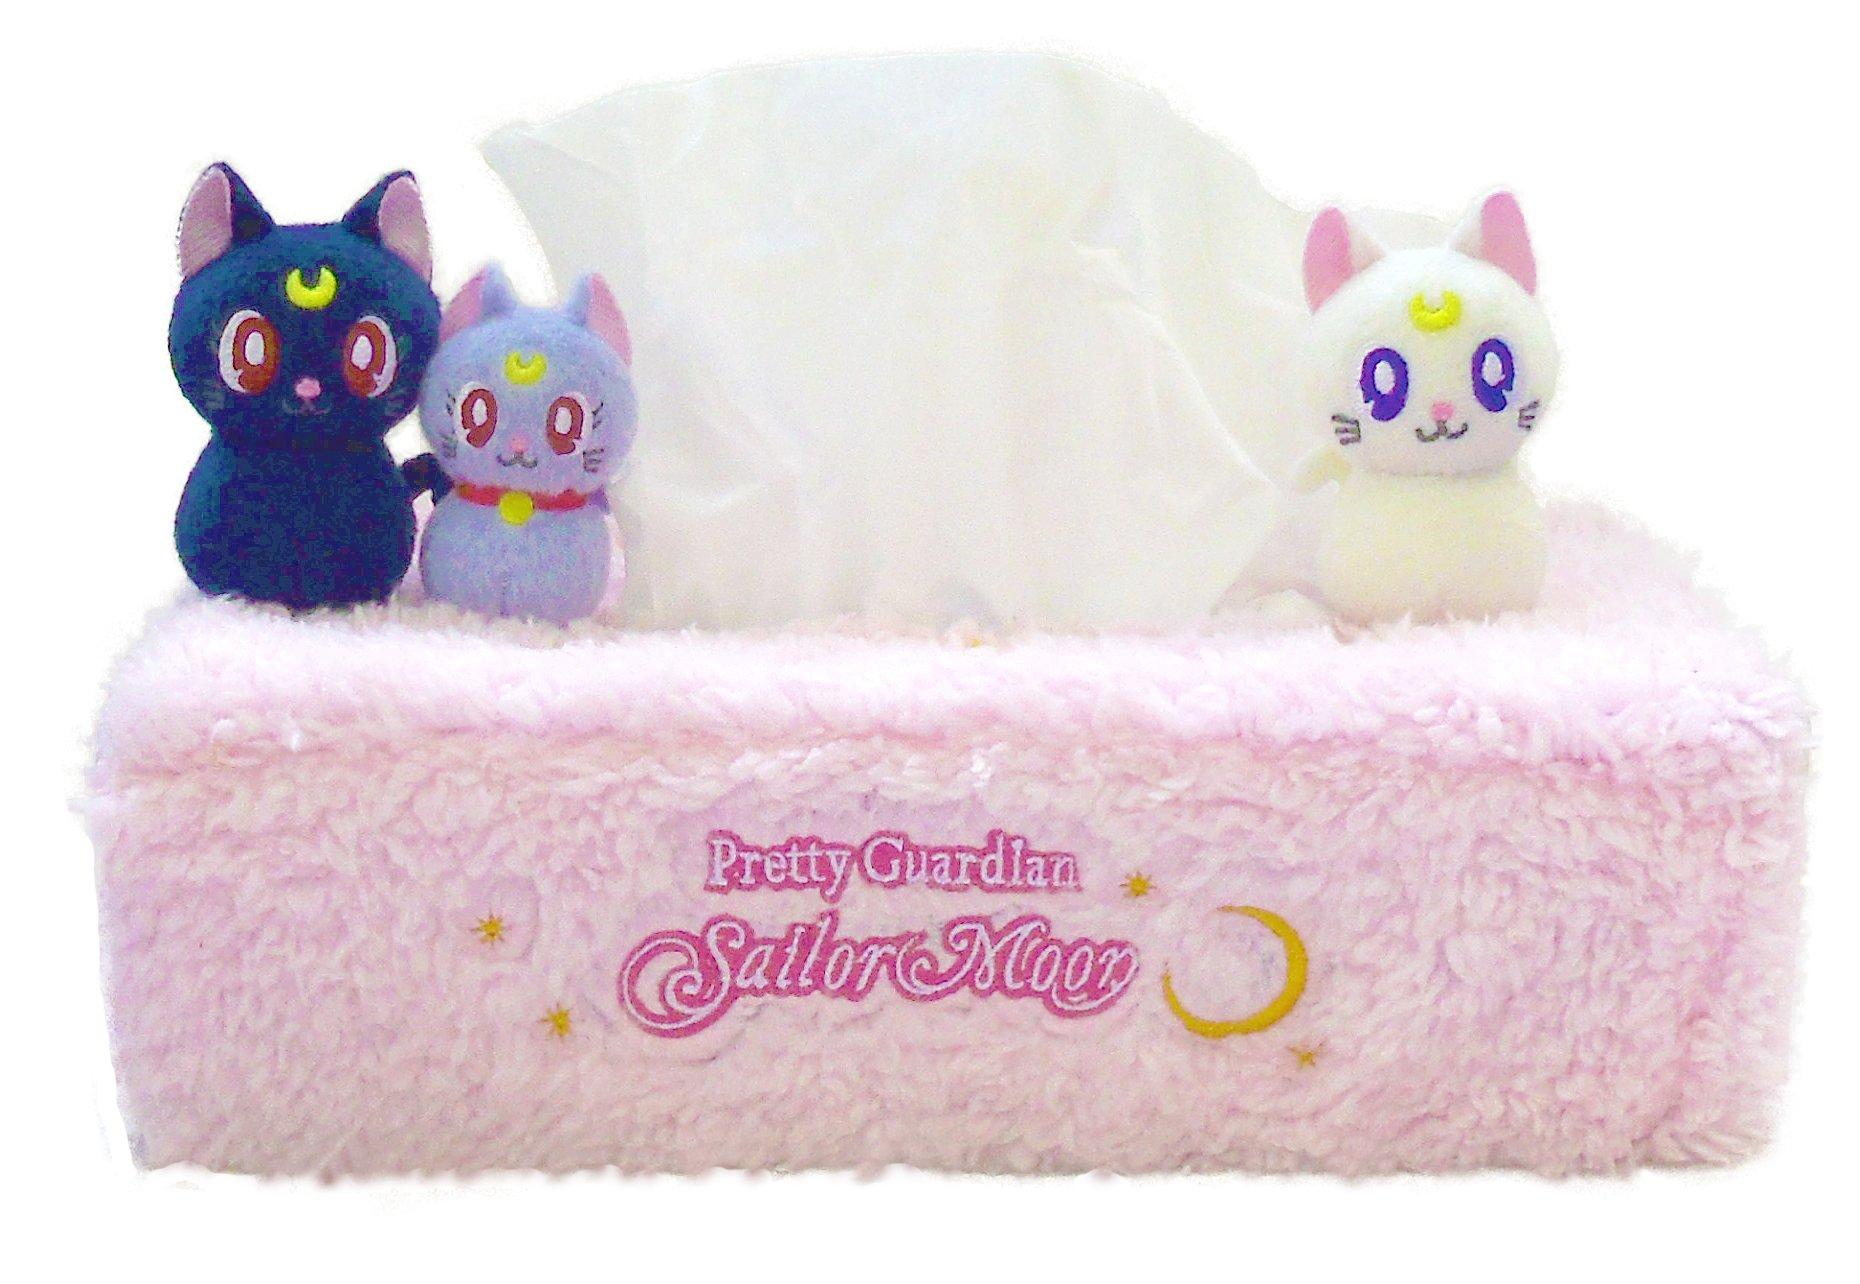 Sailor Moon diorama BOX tissue cover